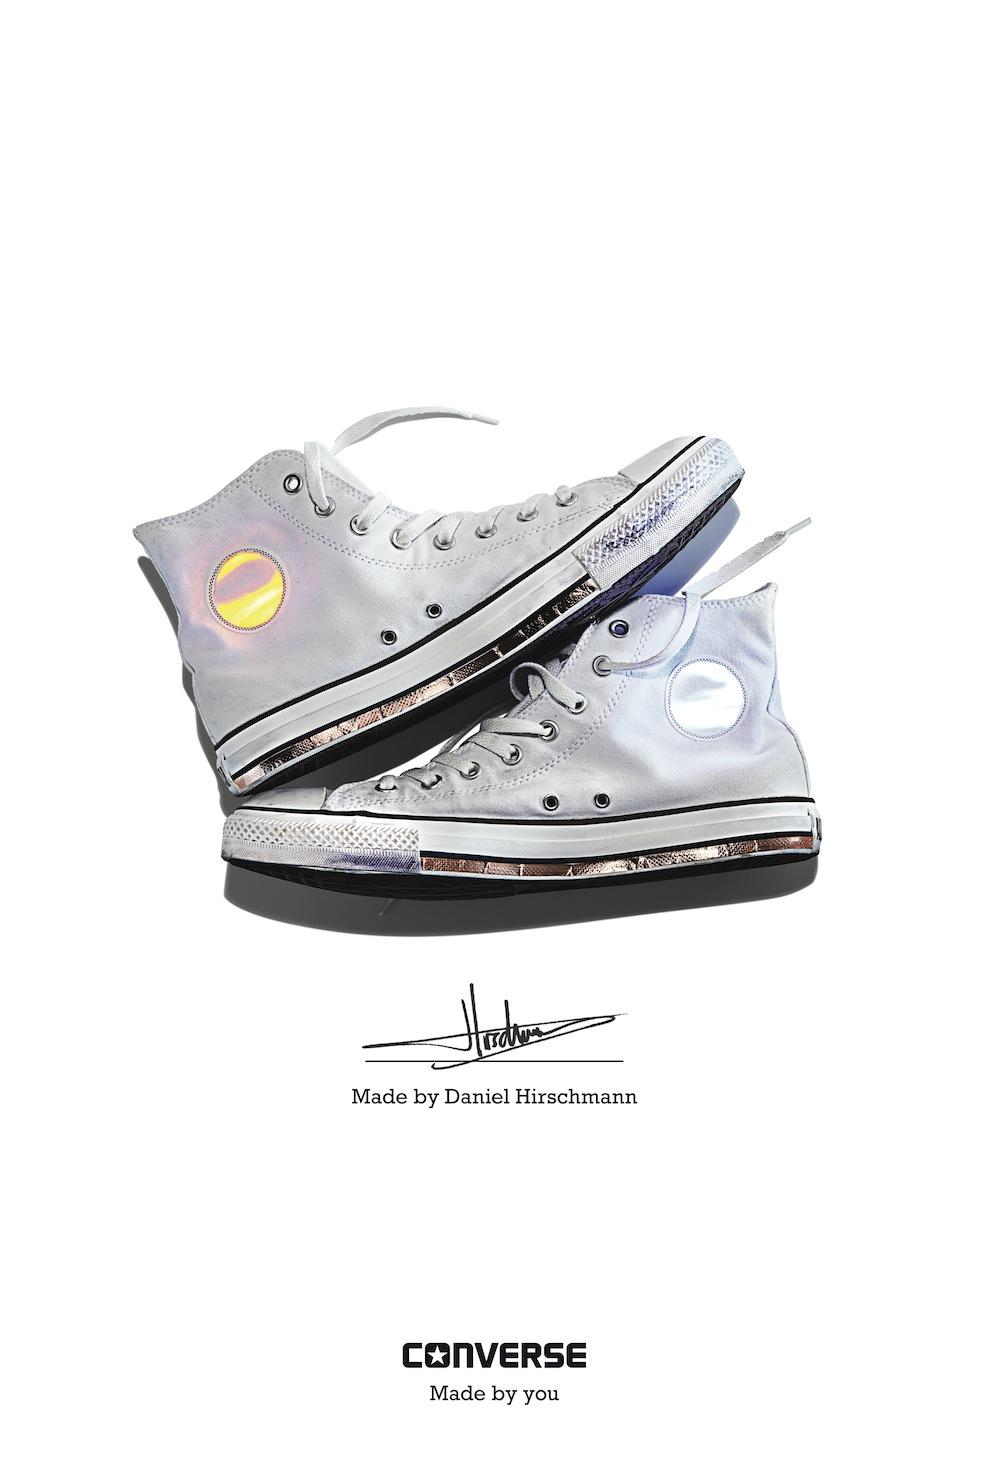 Daniel Hirschmann - Converse Sneaker Portrait